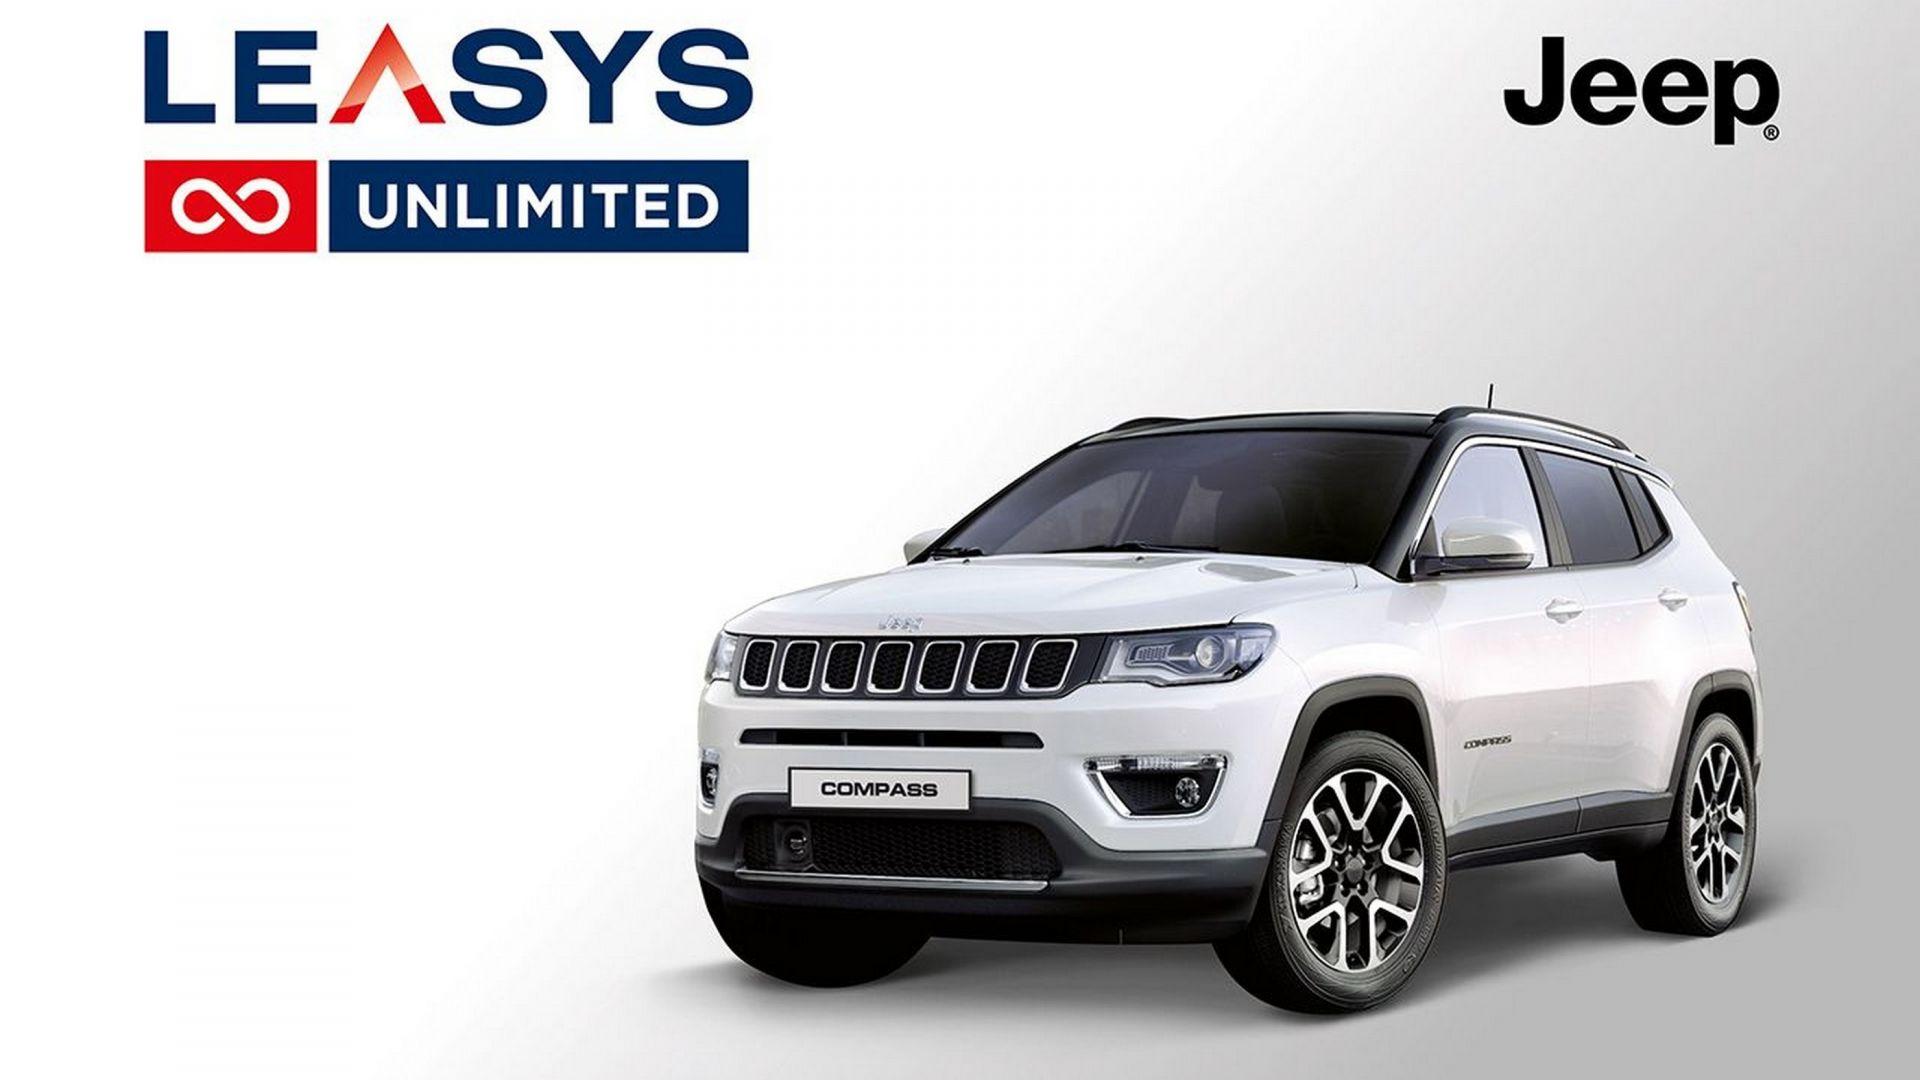 jeep compass leasys unlimited il noleggio auto a lungo termine 2 0 motorbox. Black Bedroom Furniture Sets. Home Design Ideas